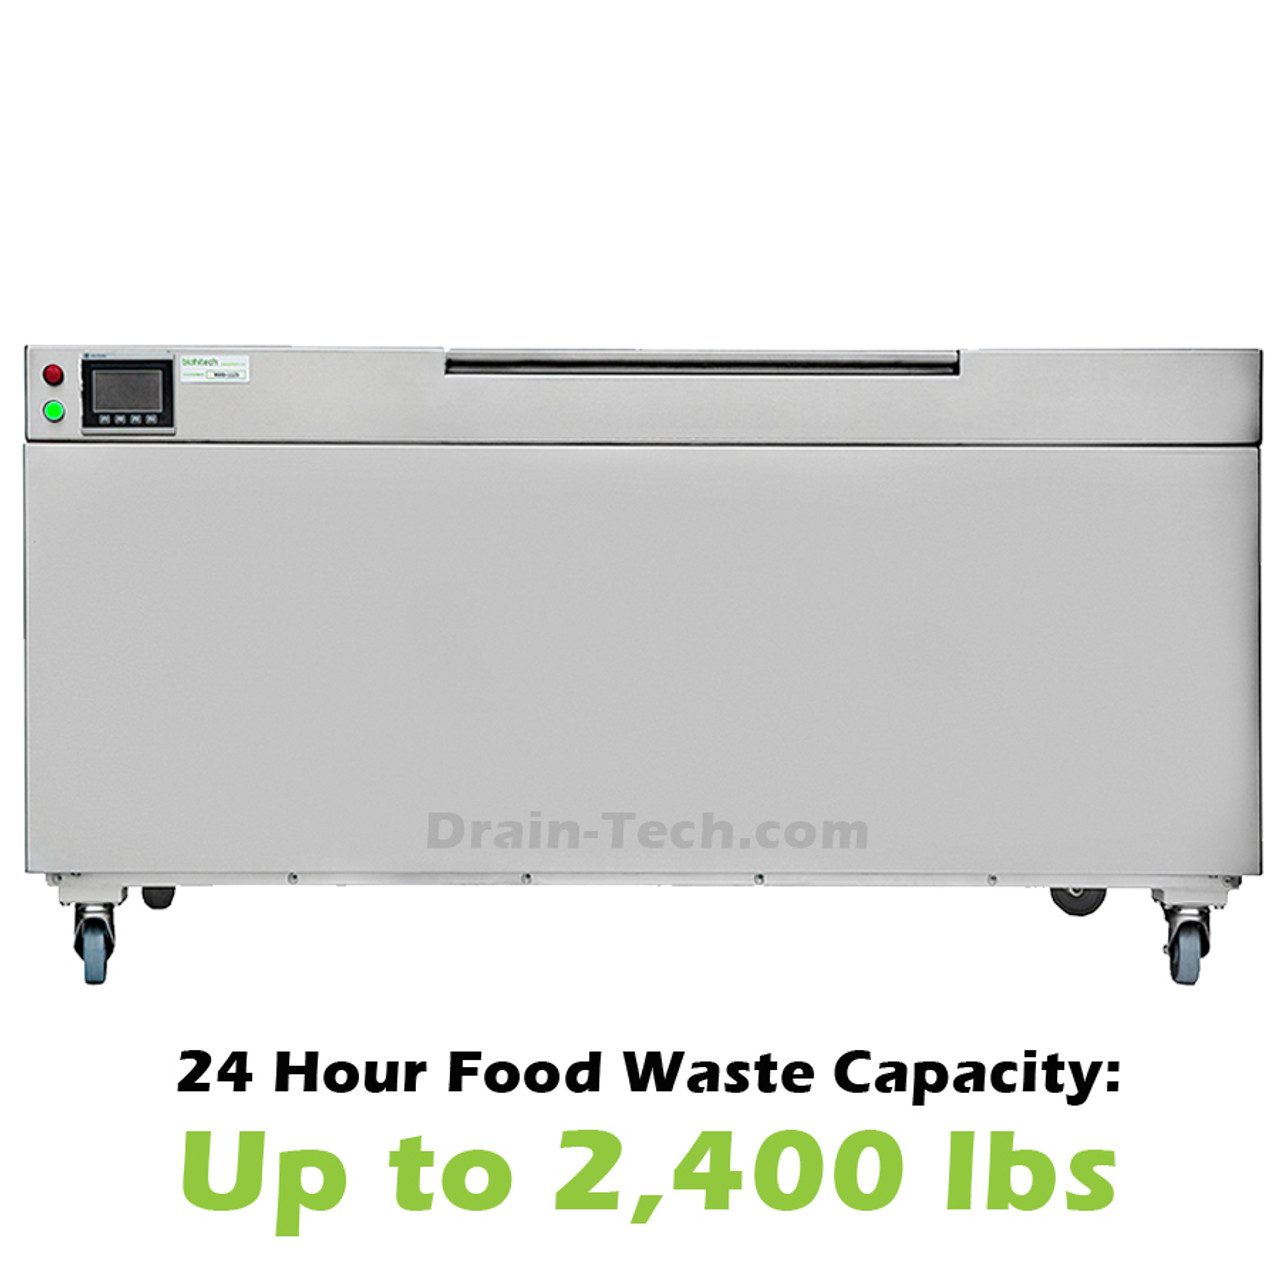 Sequoia food waste bio digester